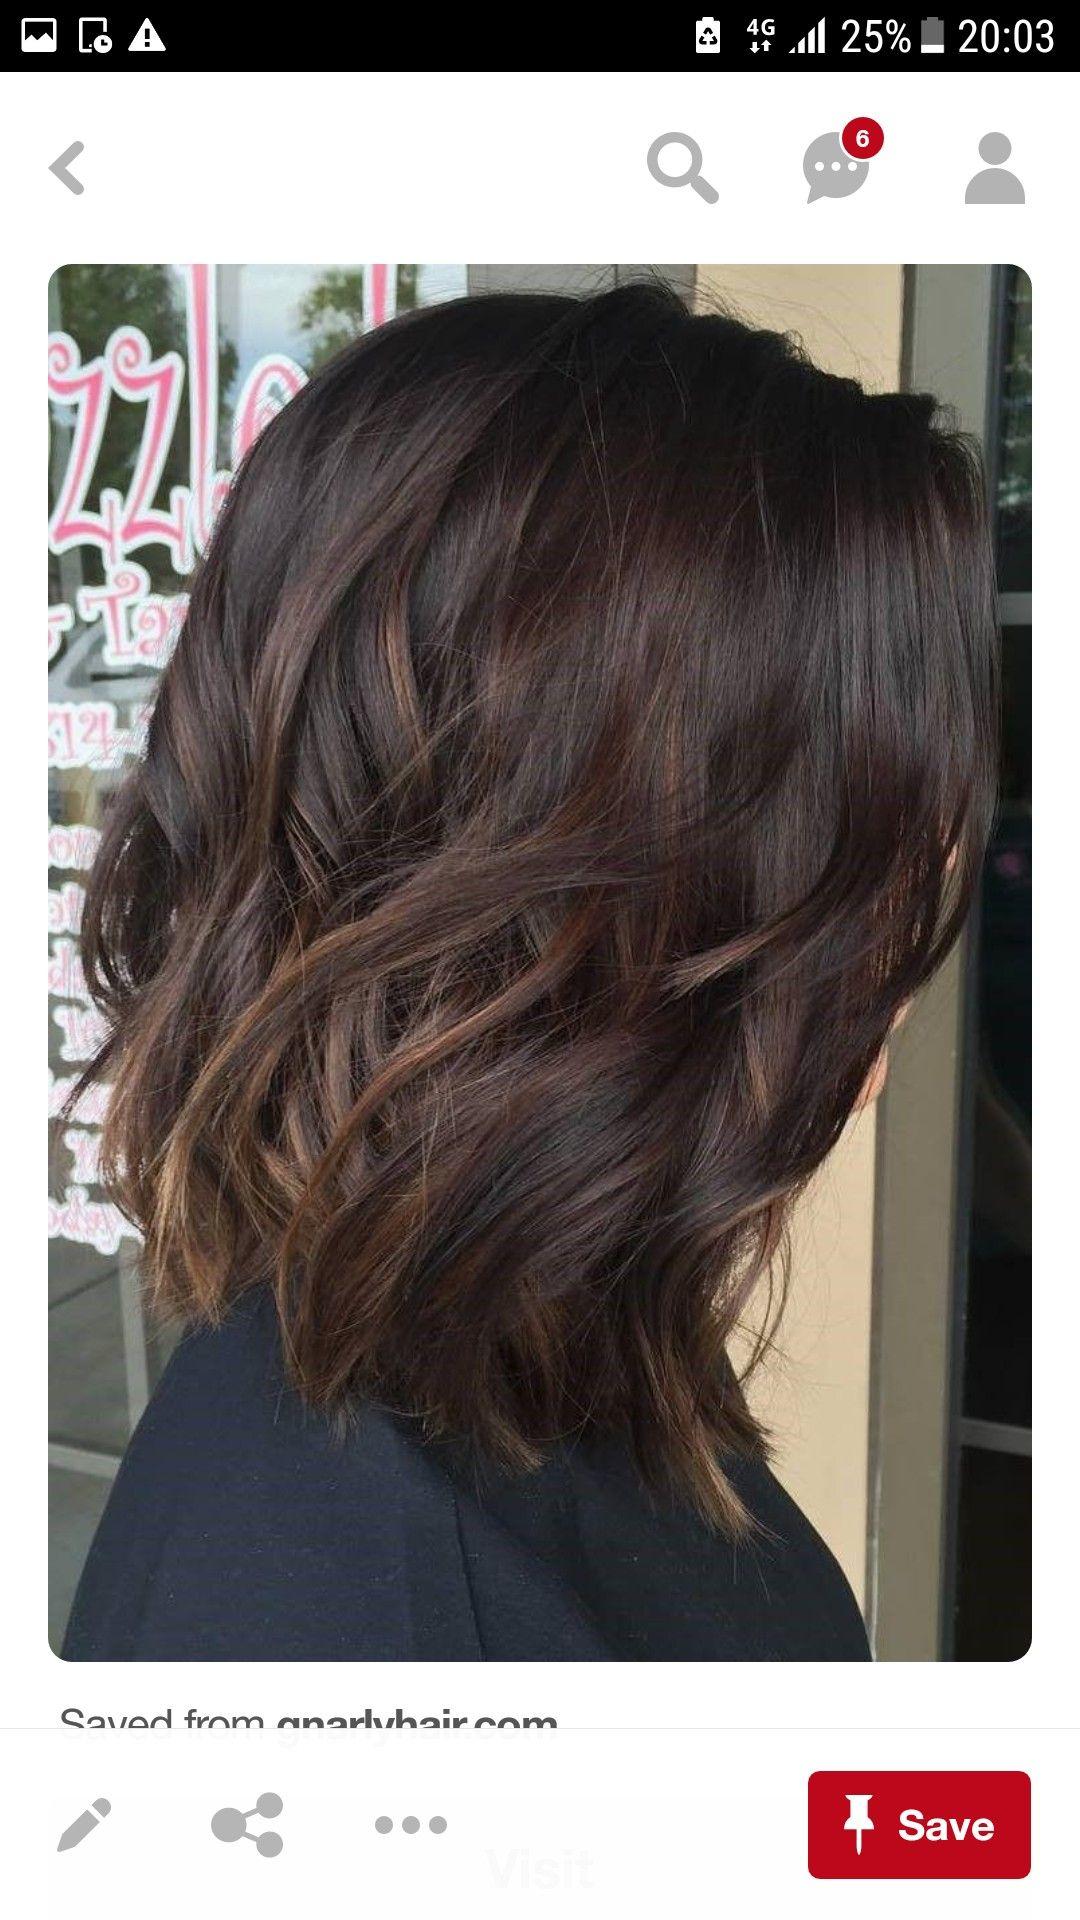 Boy hair color images pin by crystal scott on hair ideas  pinterest  hair style hair